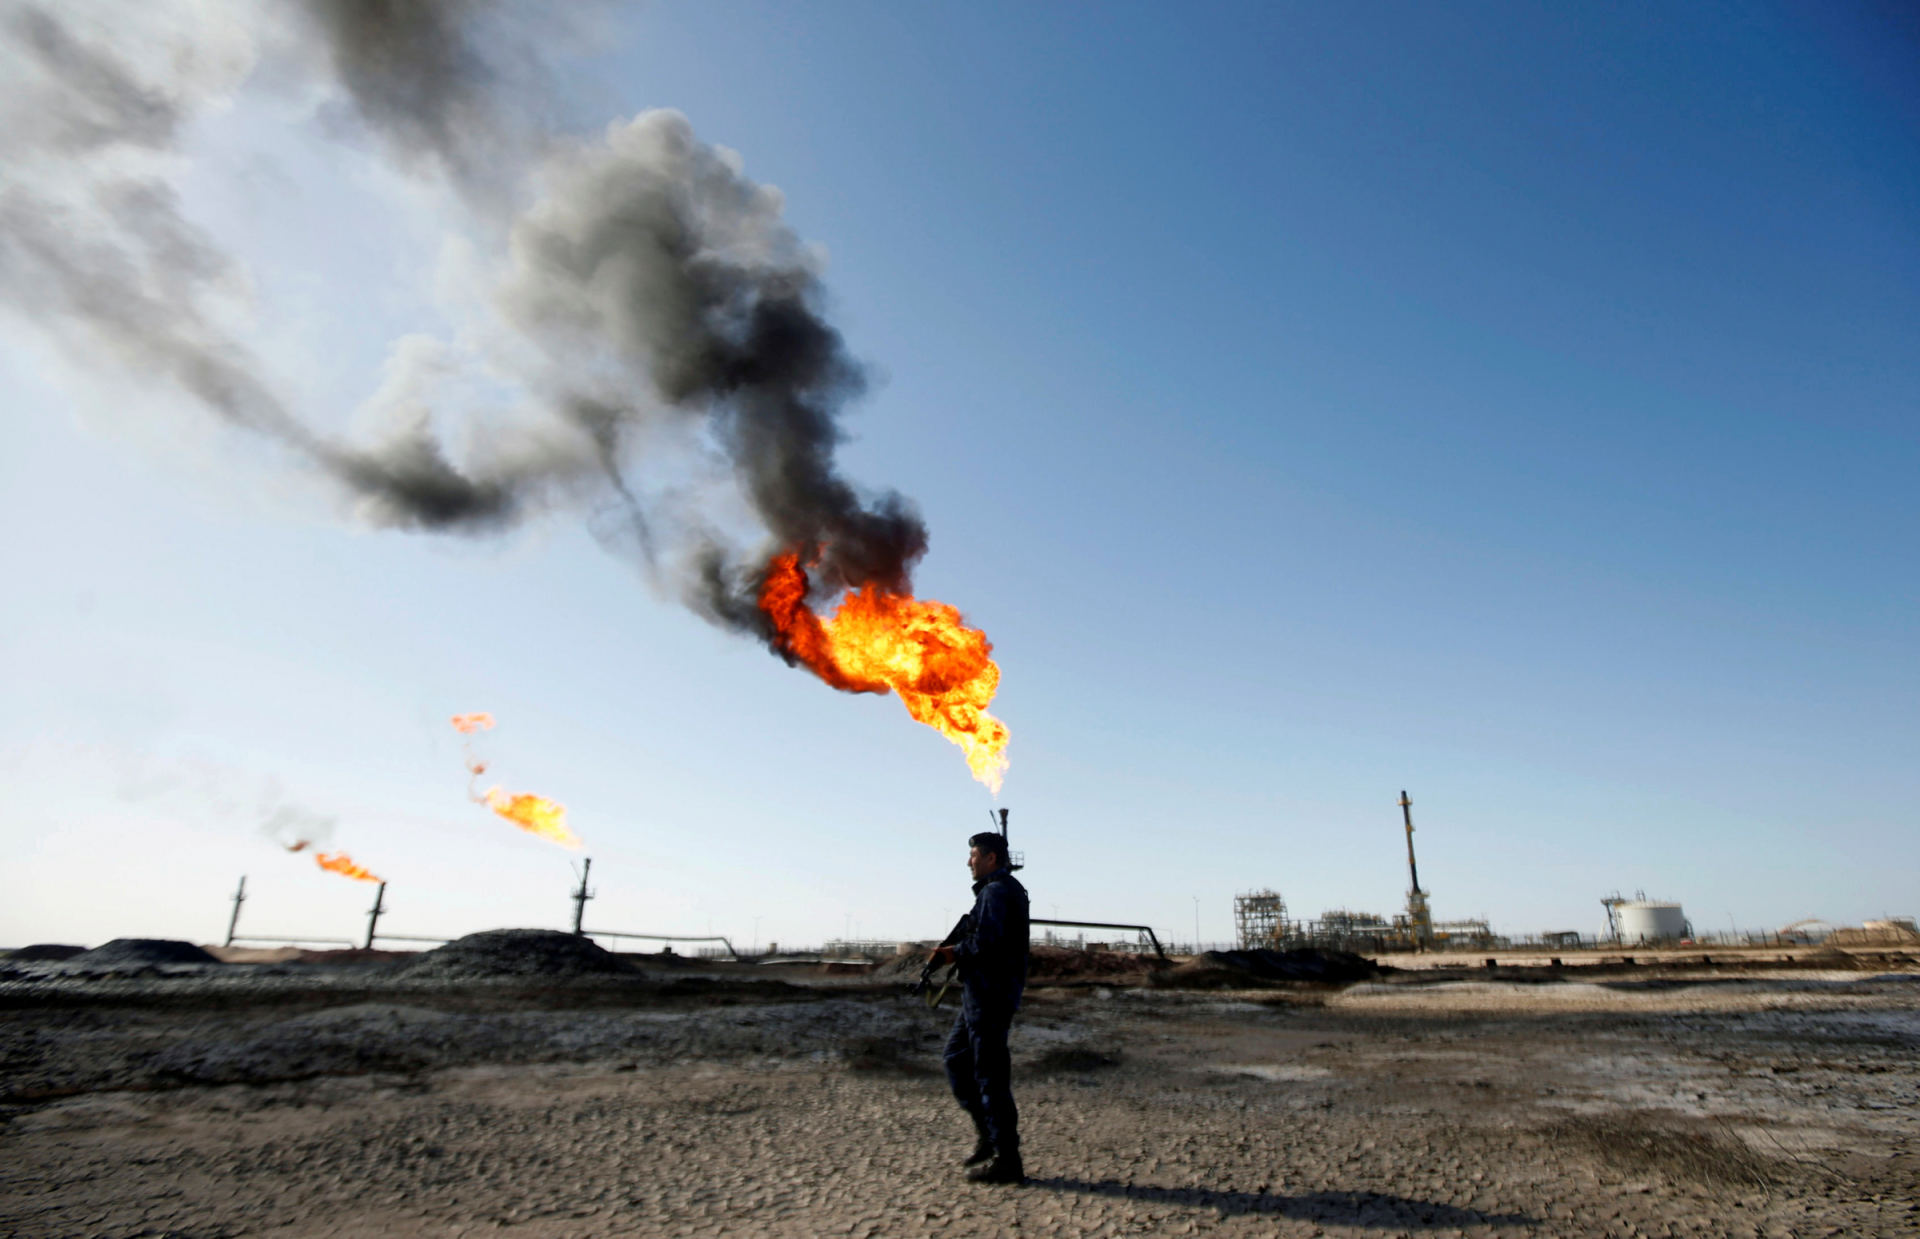 skundai dl prekybos nafta